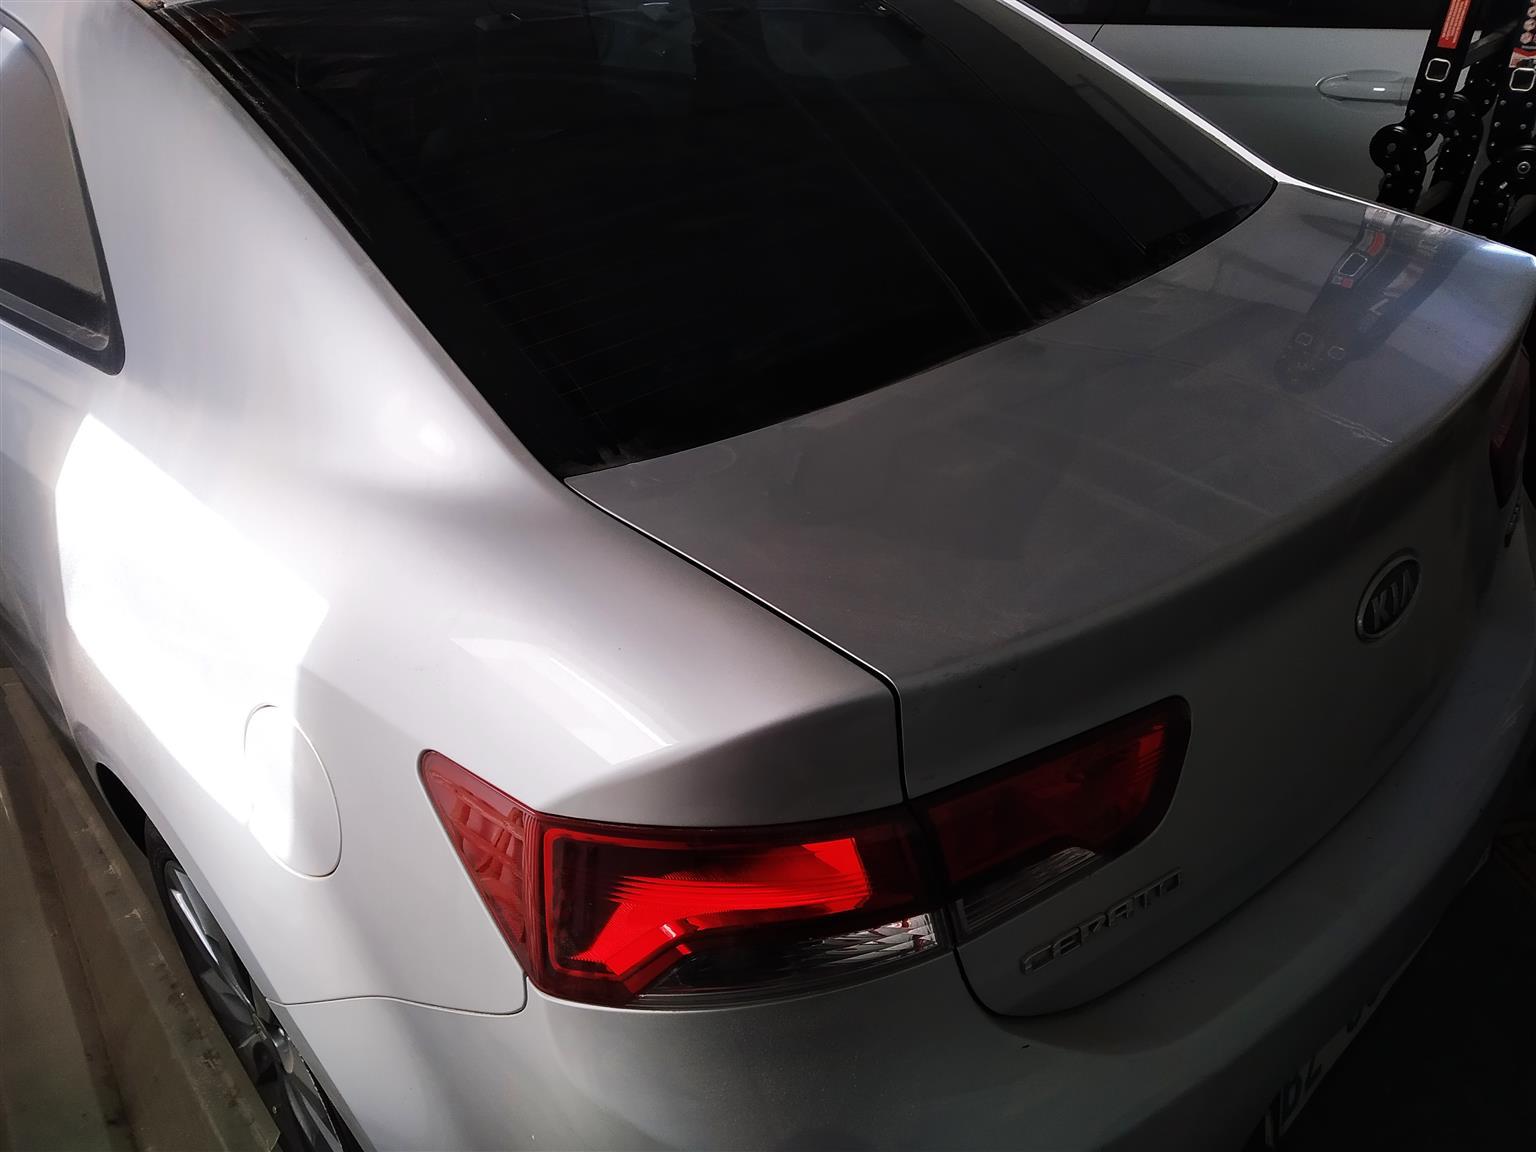 2012 Kia Cerato Koup 2.0 SX